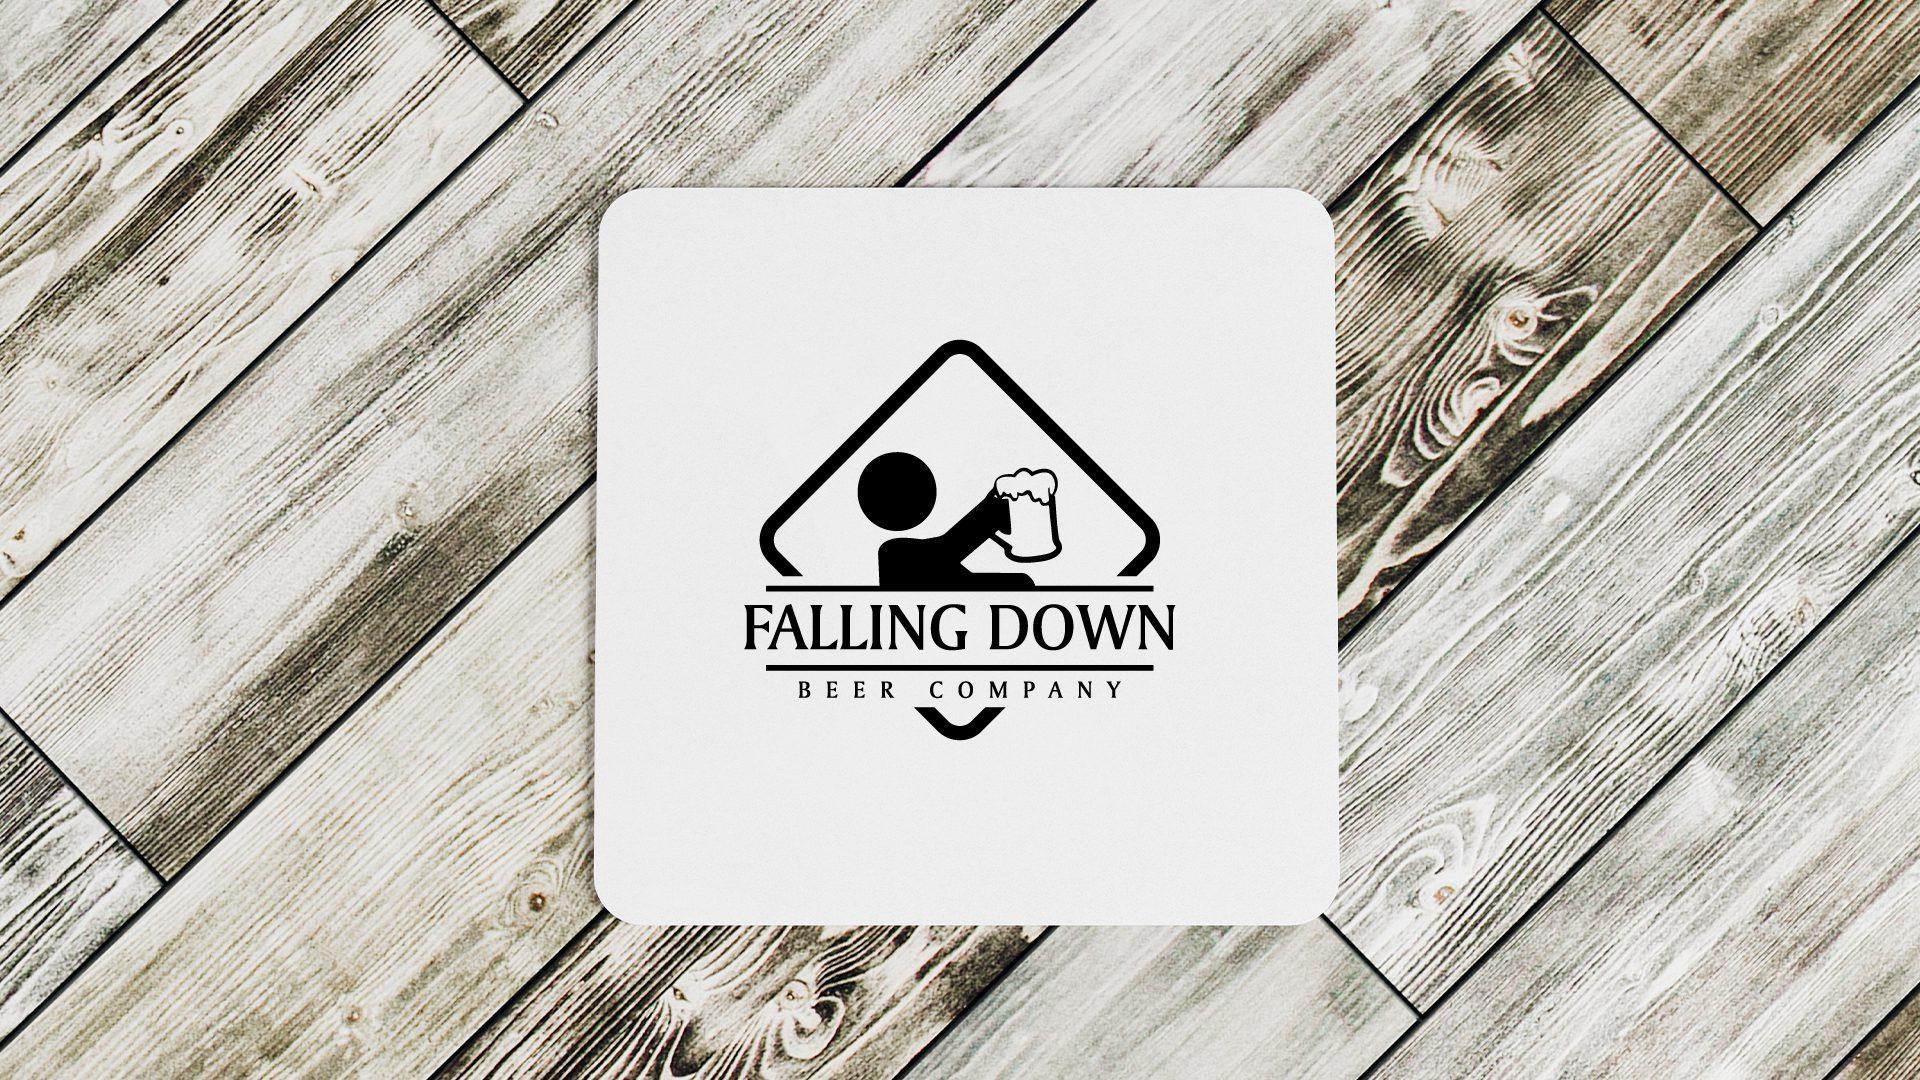 Falling Down Beer Company - Coasters Mockup 01